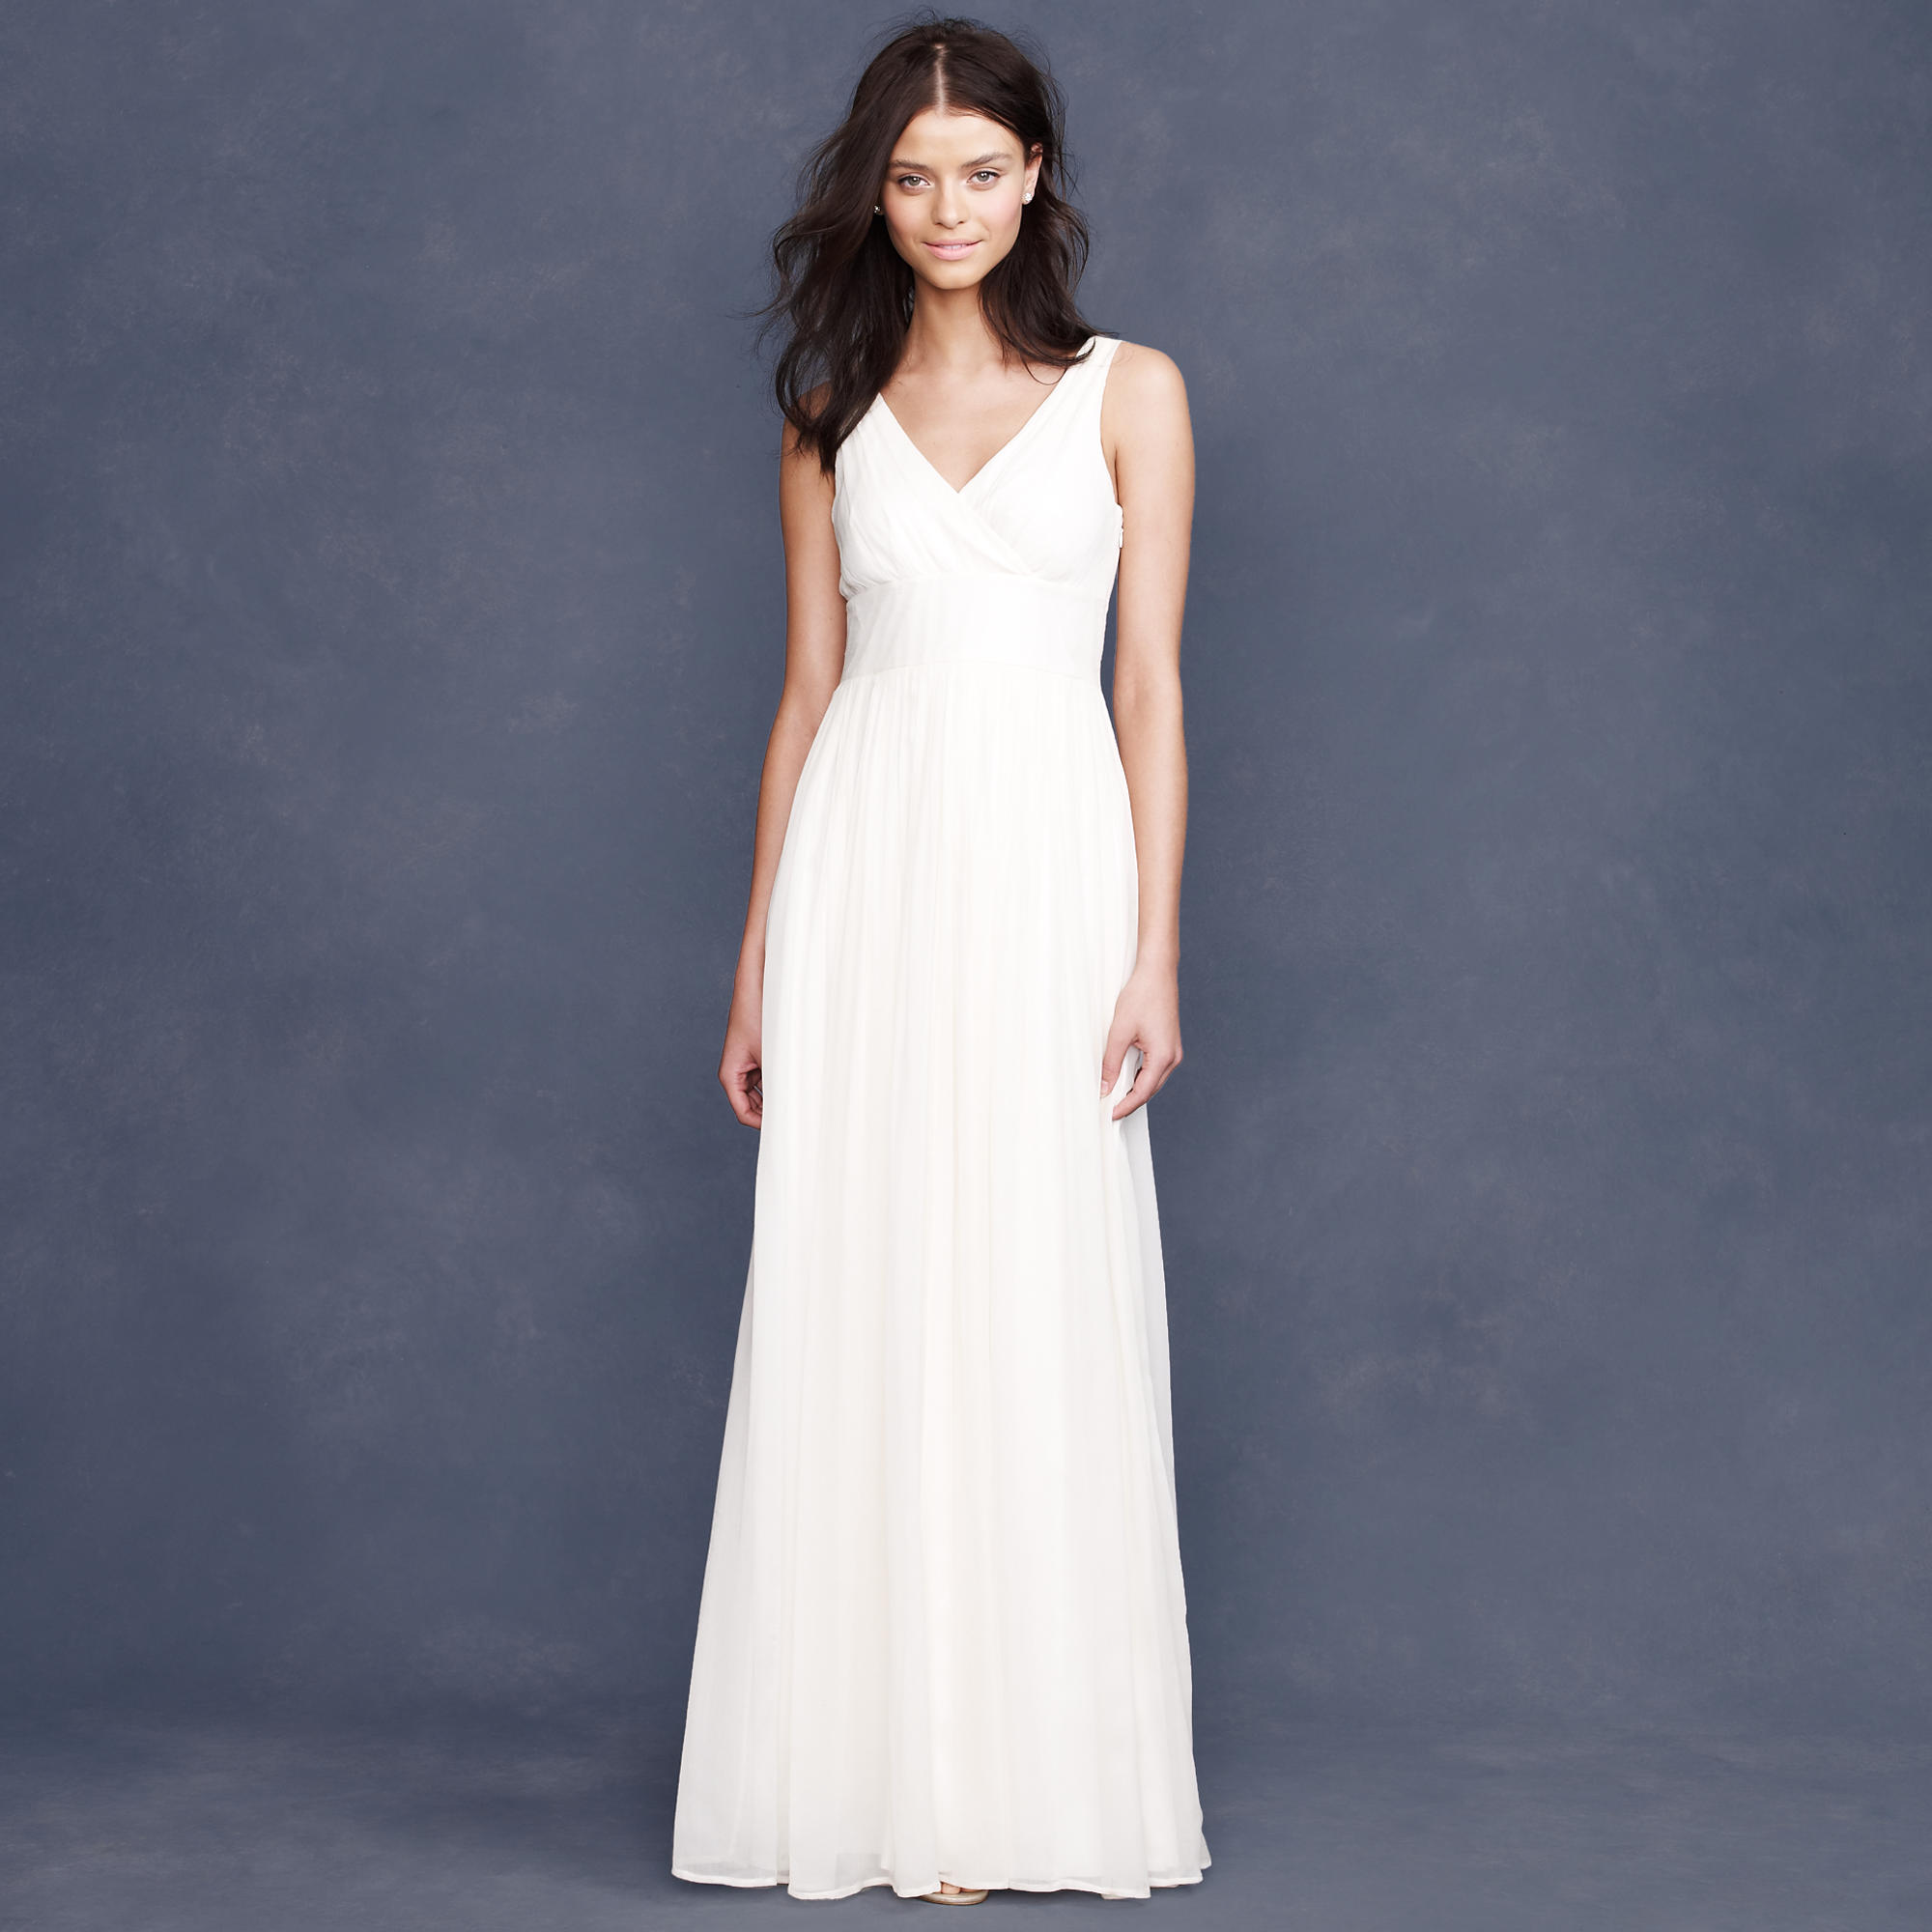 Sophia gown in silk chiffon j crew for J crew dresses wedding